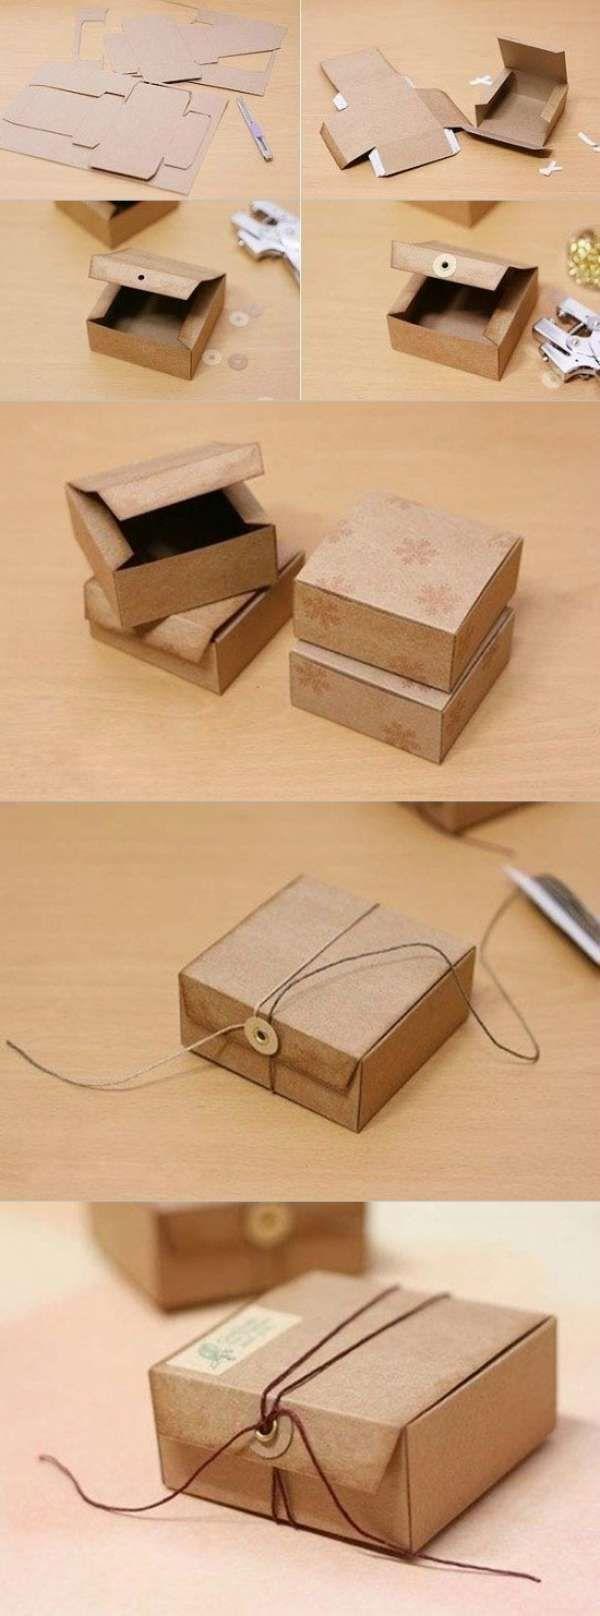 16 cr ations originales partir de boites en carton boite en carton boite cadeau et carton - Comment faire une boite en carton facile ...